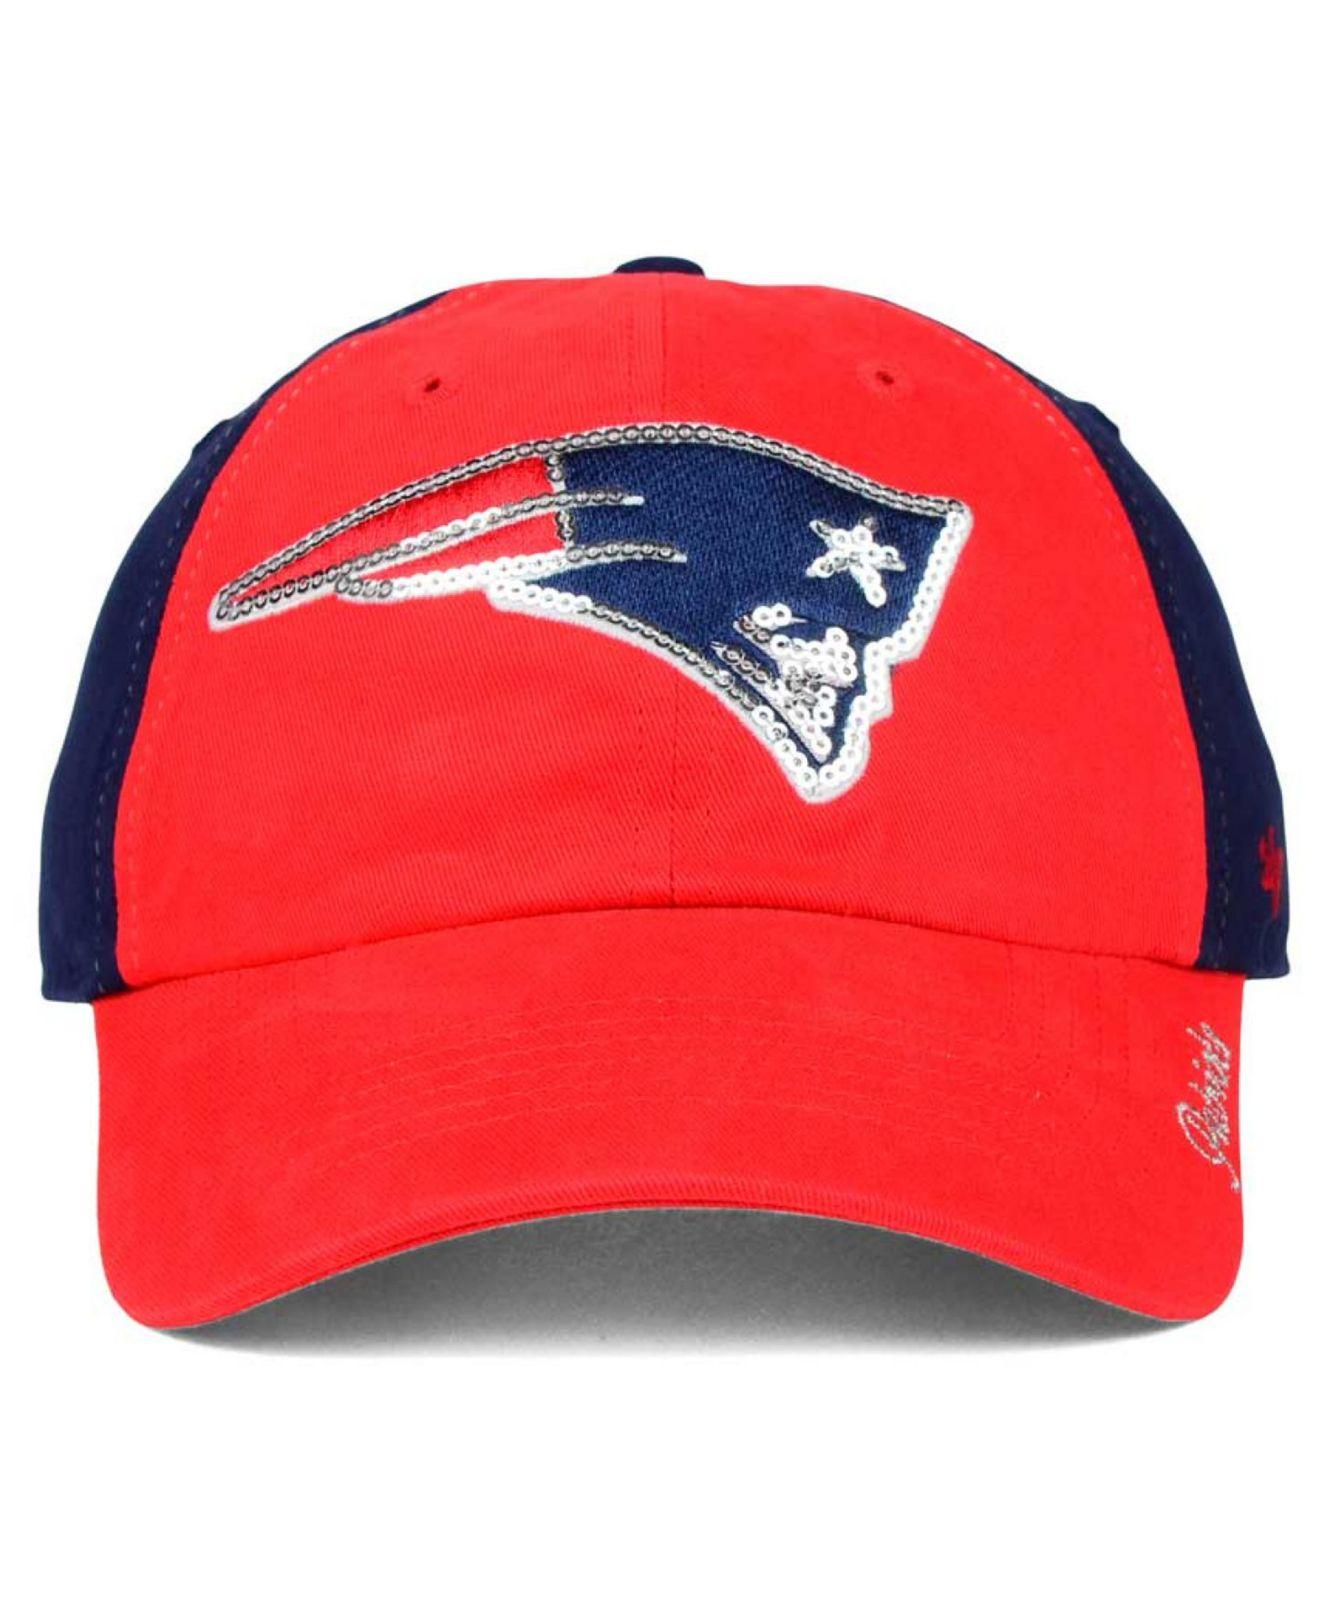 902eba47a28 Lyst - 47 Brand Women s New England Patriots Sparkle 2-tone ...